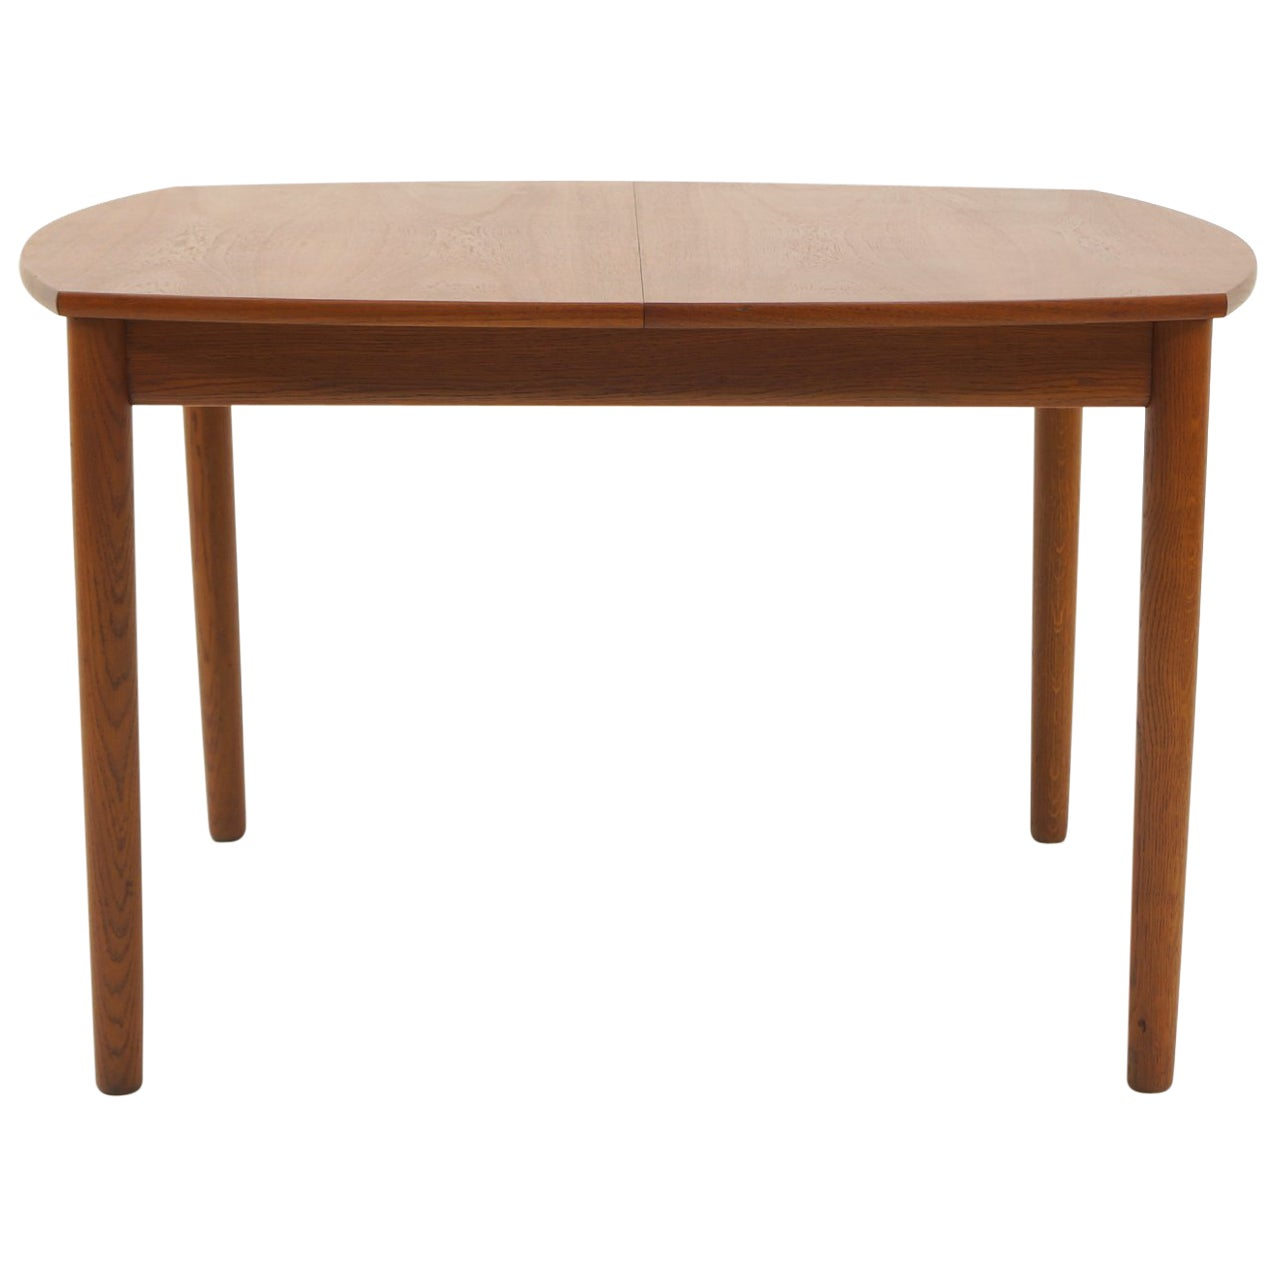 Square Expanding Danish Modern Teak Dining Table by Ejner Larsen & Aksel Madsen